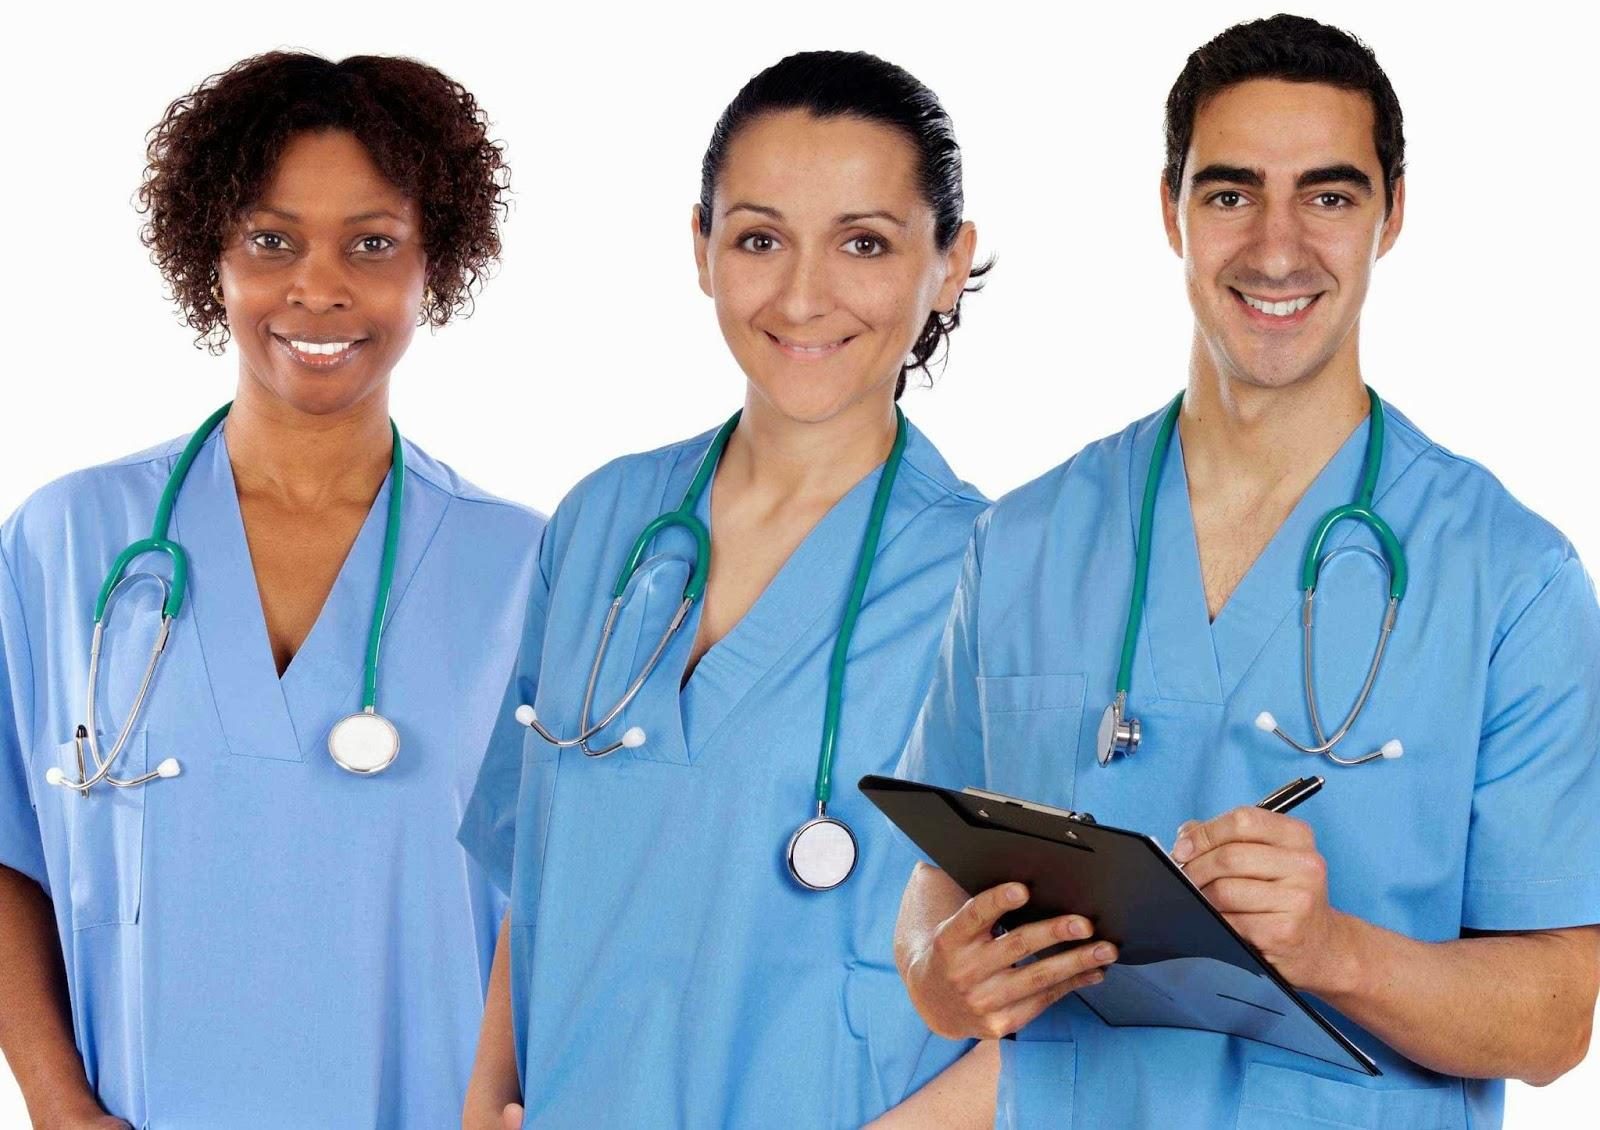 What to Expect at Nursing Schools | Nursing Schools